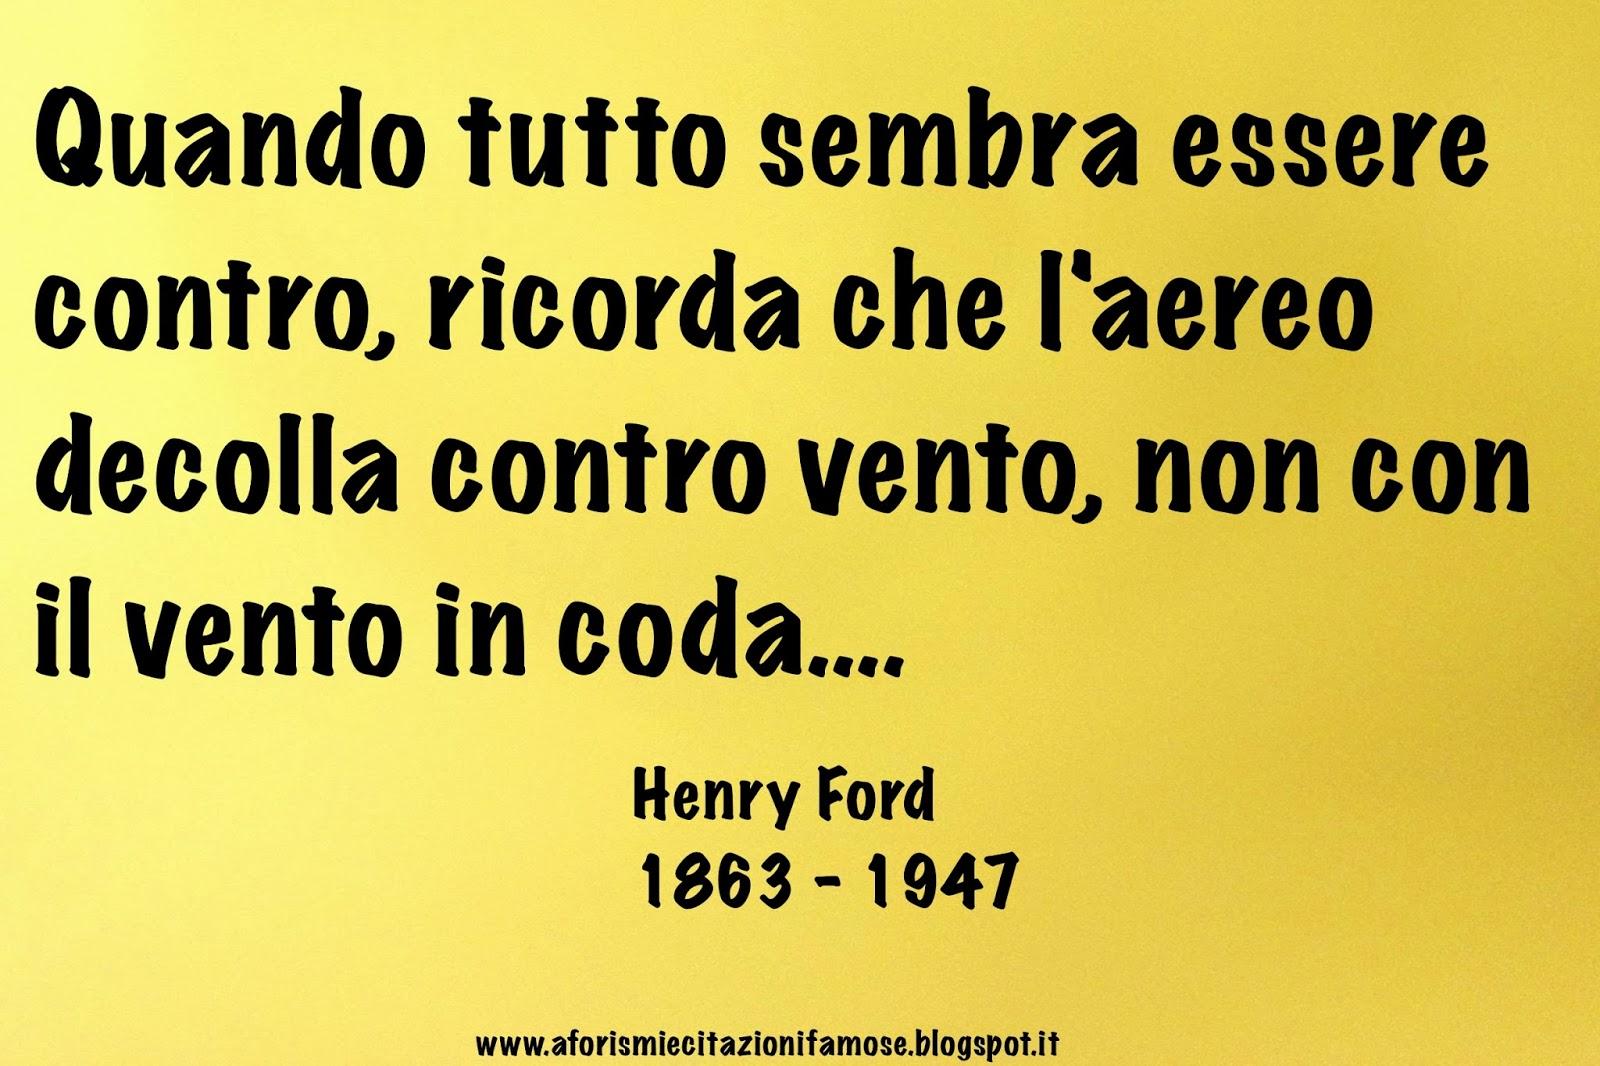 Aforismi E Citazioni Famose Frase Celebre Henry Ford